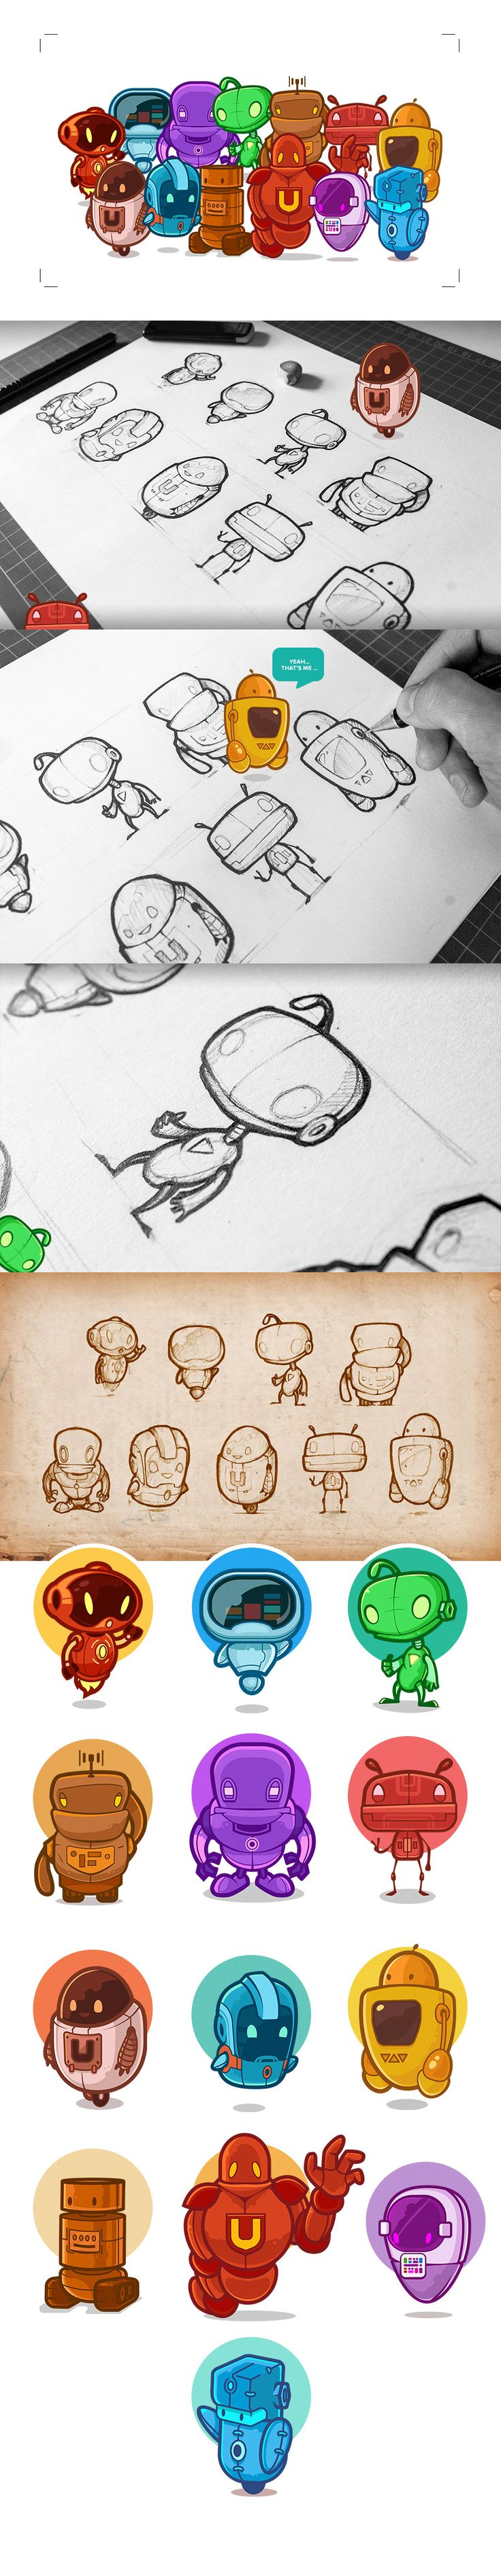 Robot Characters on Behance